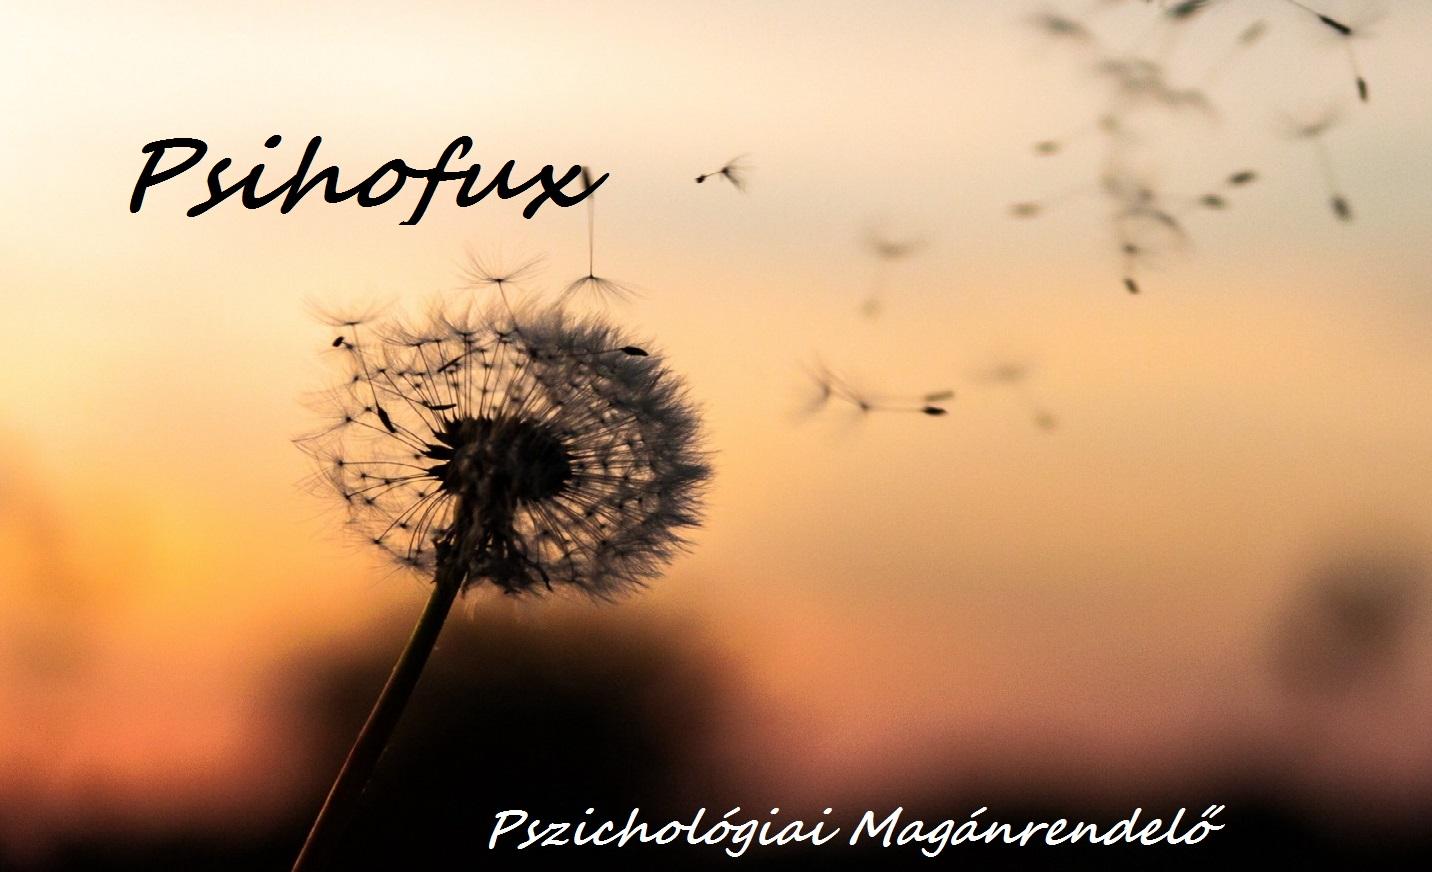 Psihofux-Pszichológiai Magánrendelő